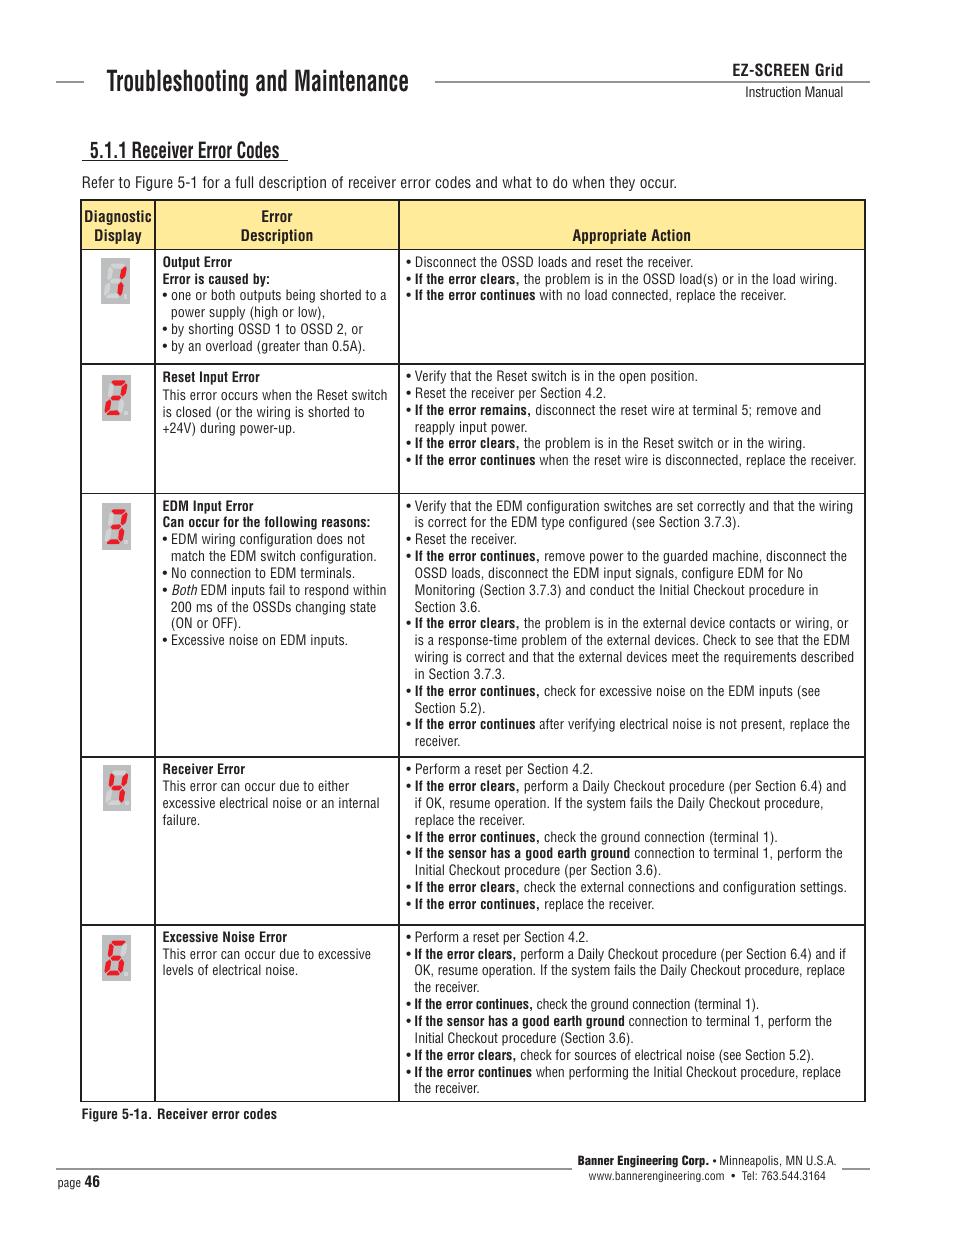 Keyence Light Curtain Error Code 32 Www Myfamilyliving Com